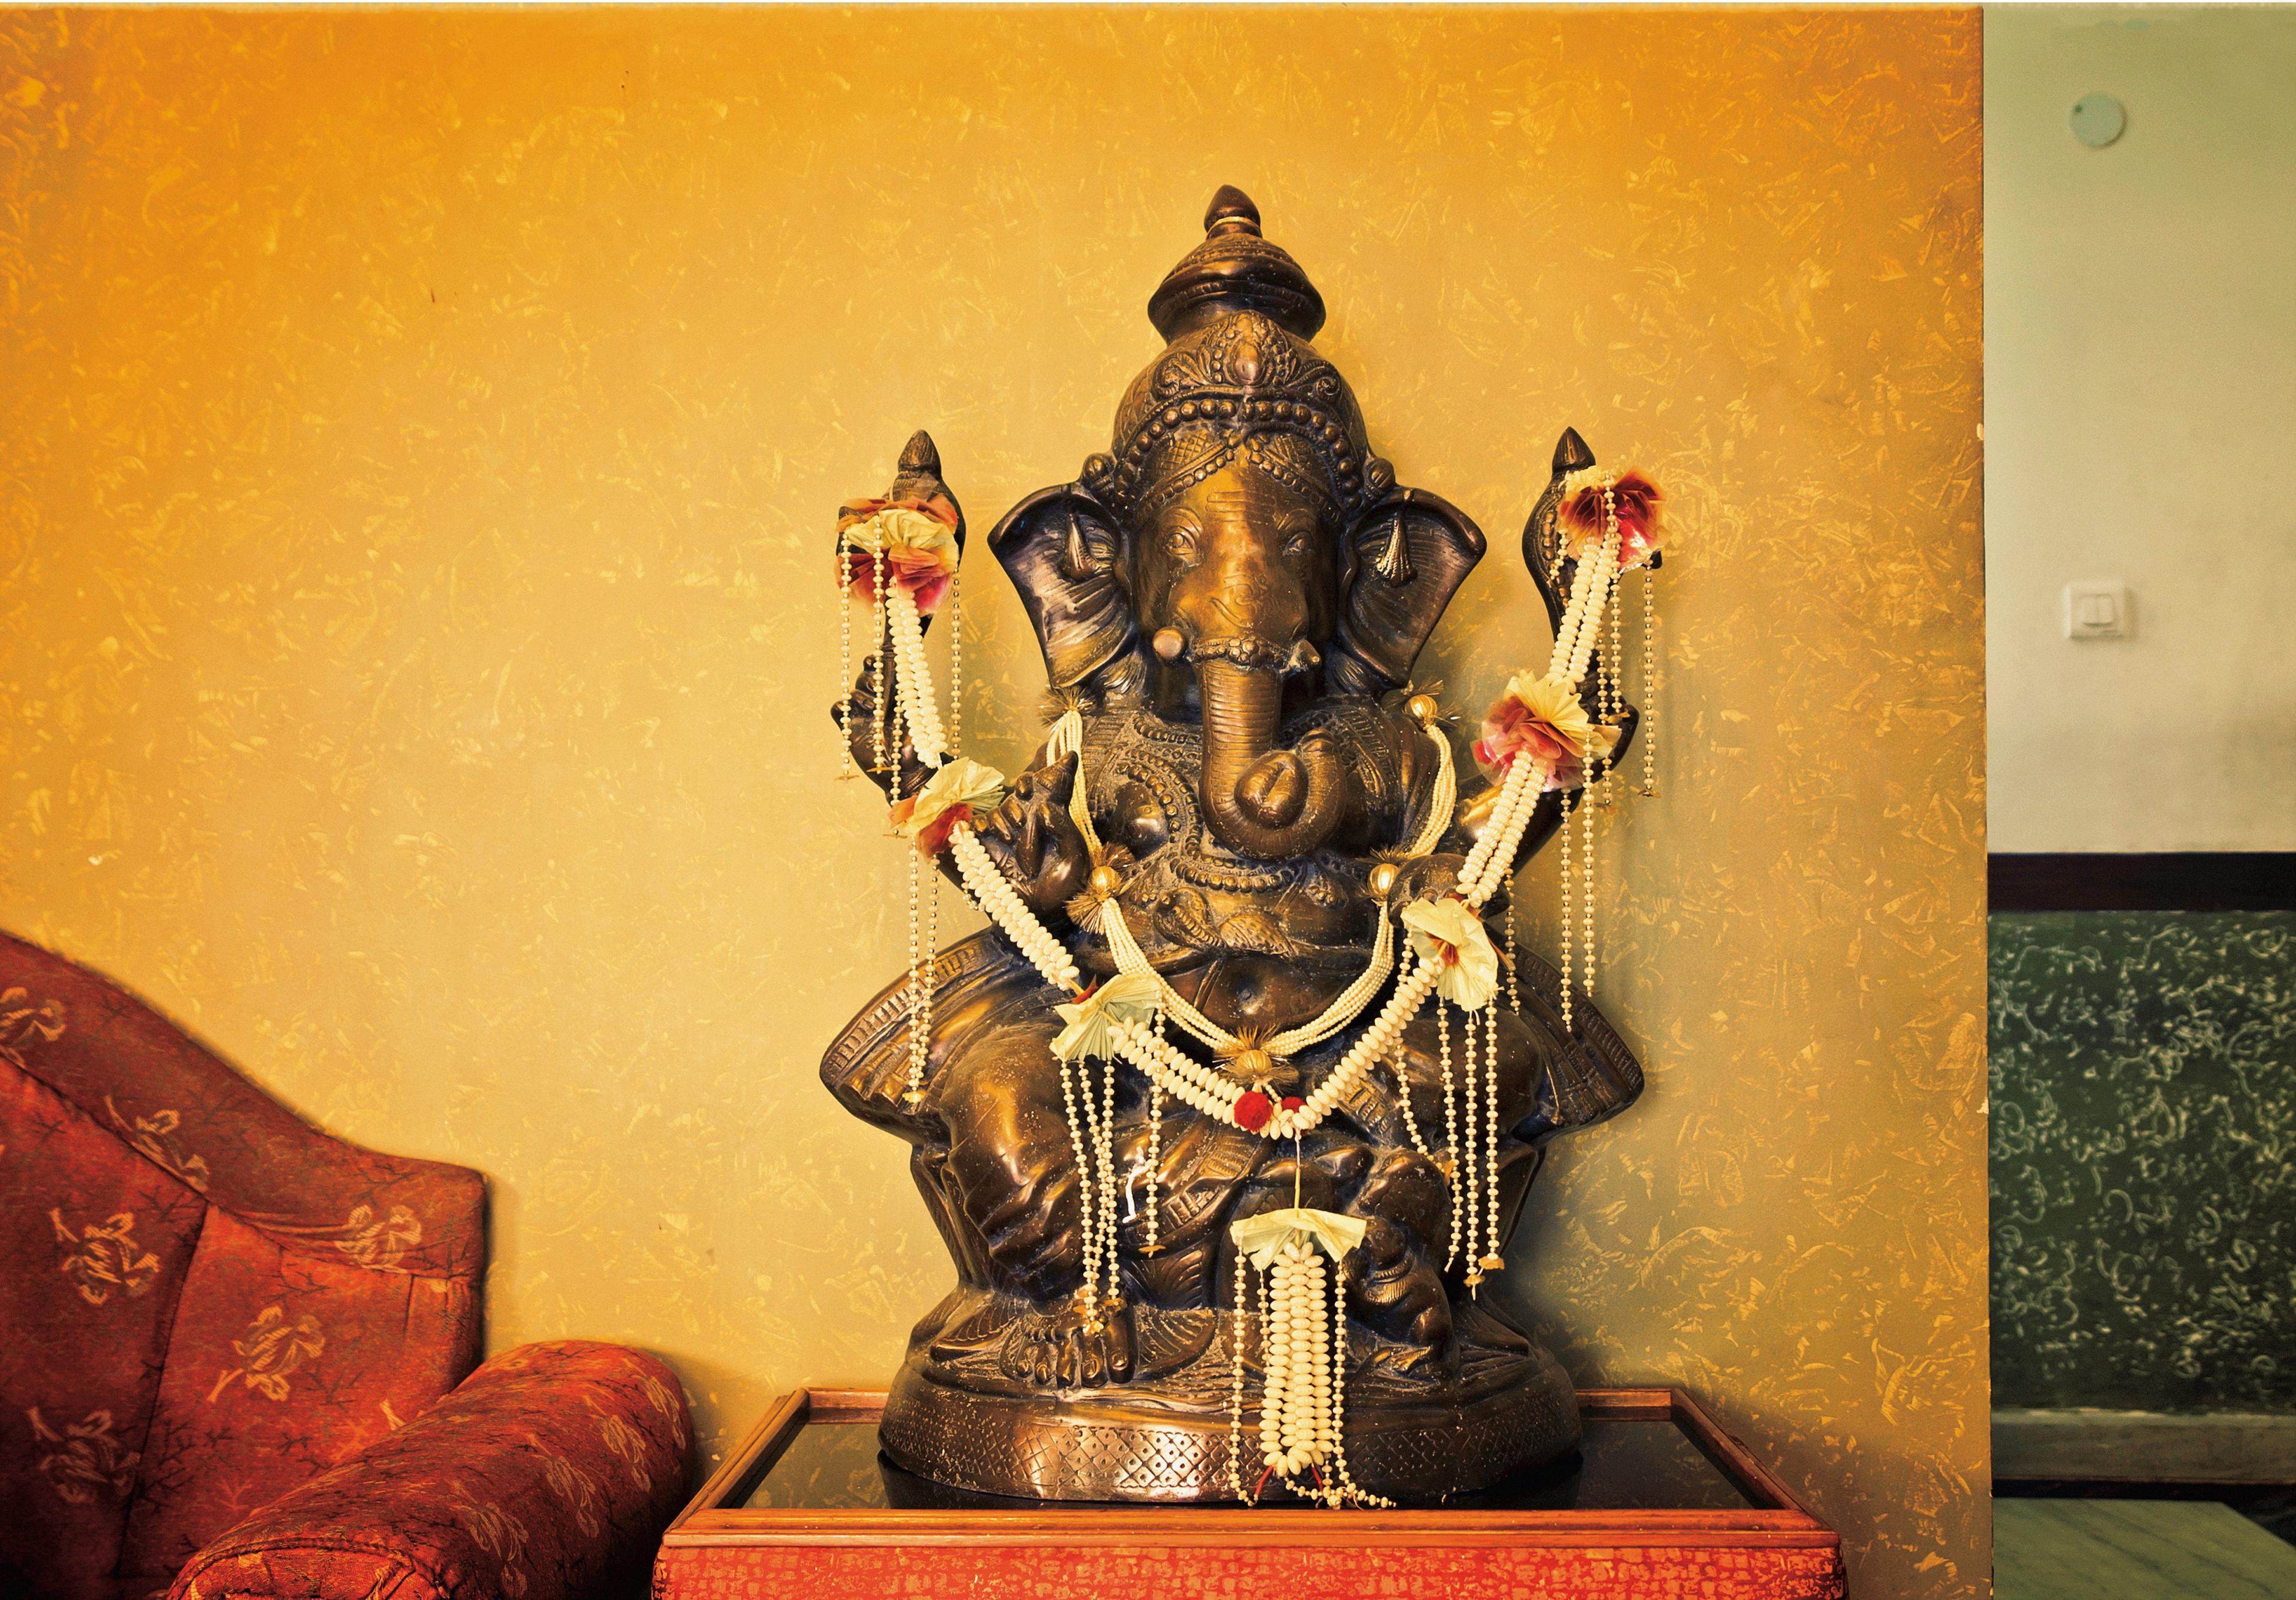 Free Images Monument Statue Decoration Religion Asia